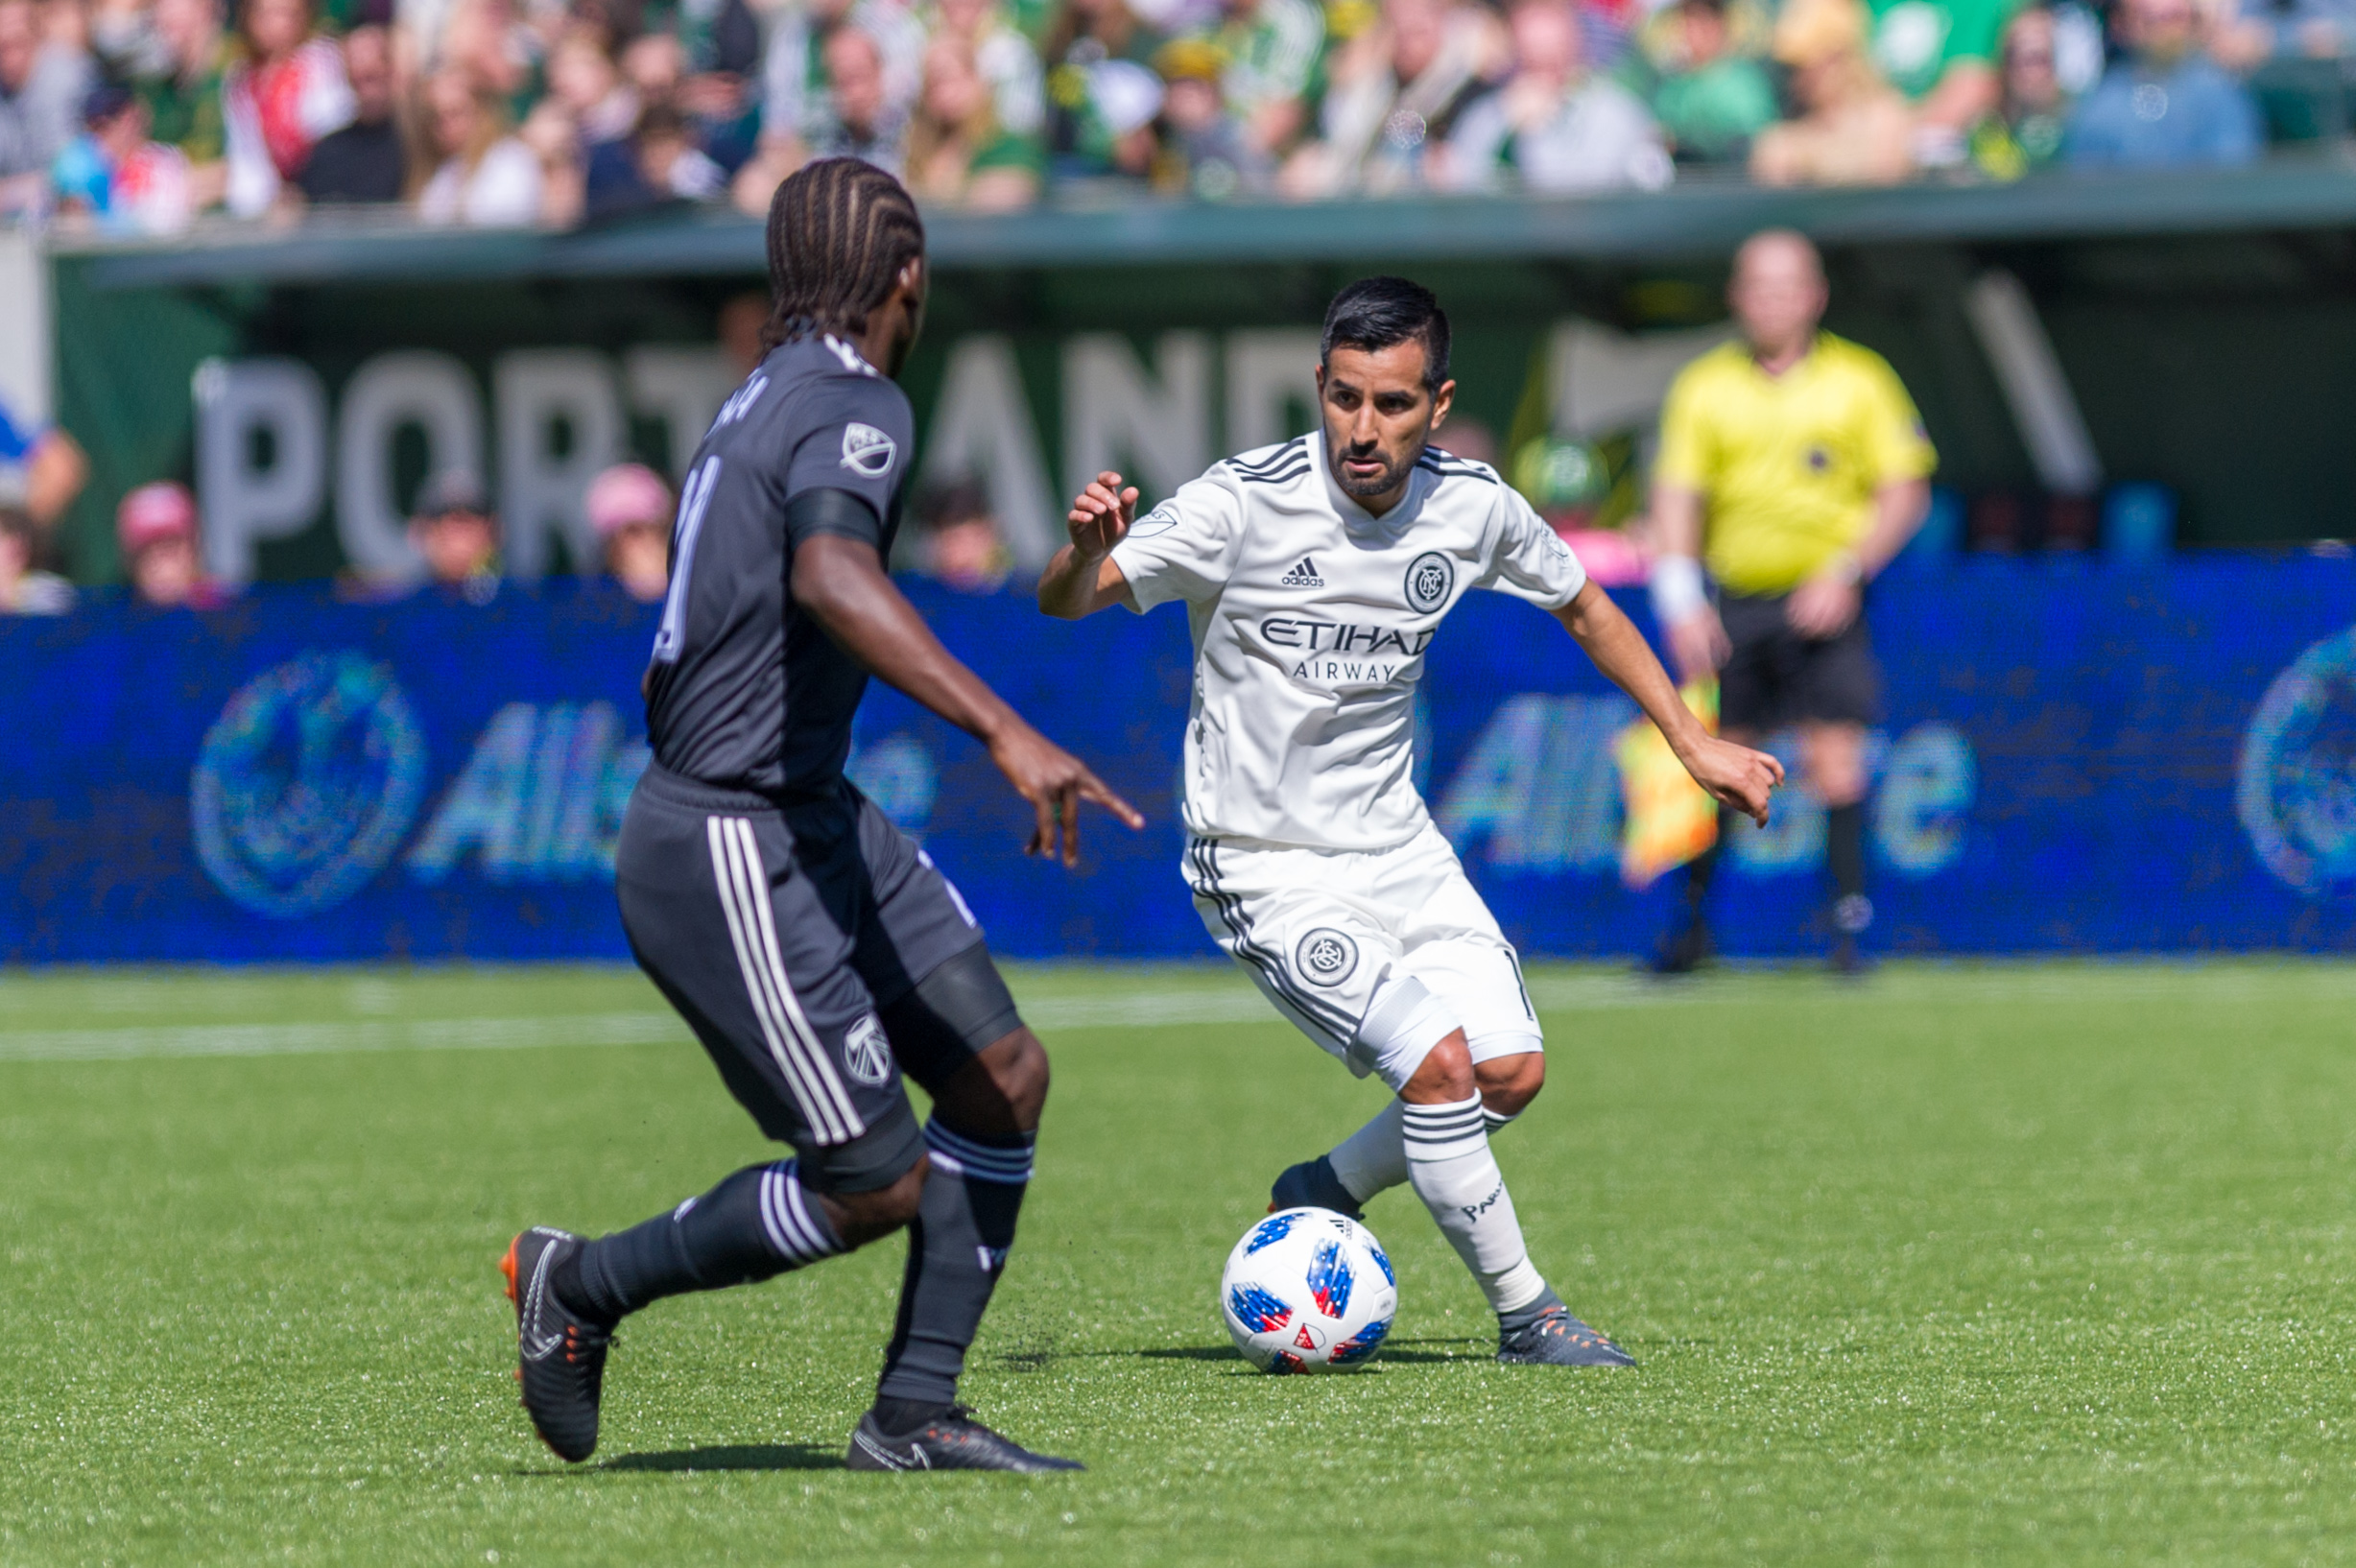 SOCCER: APR 22 MLS - New York City FC at Portland Timbers